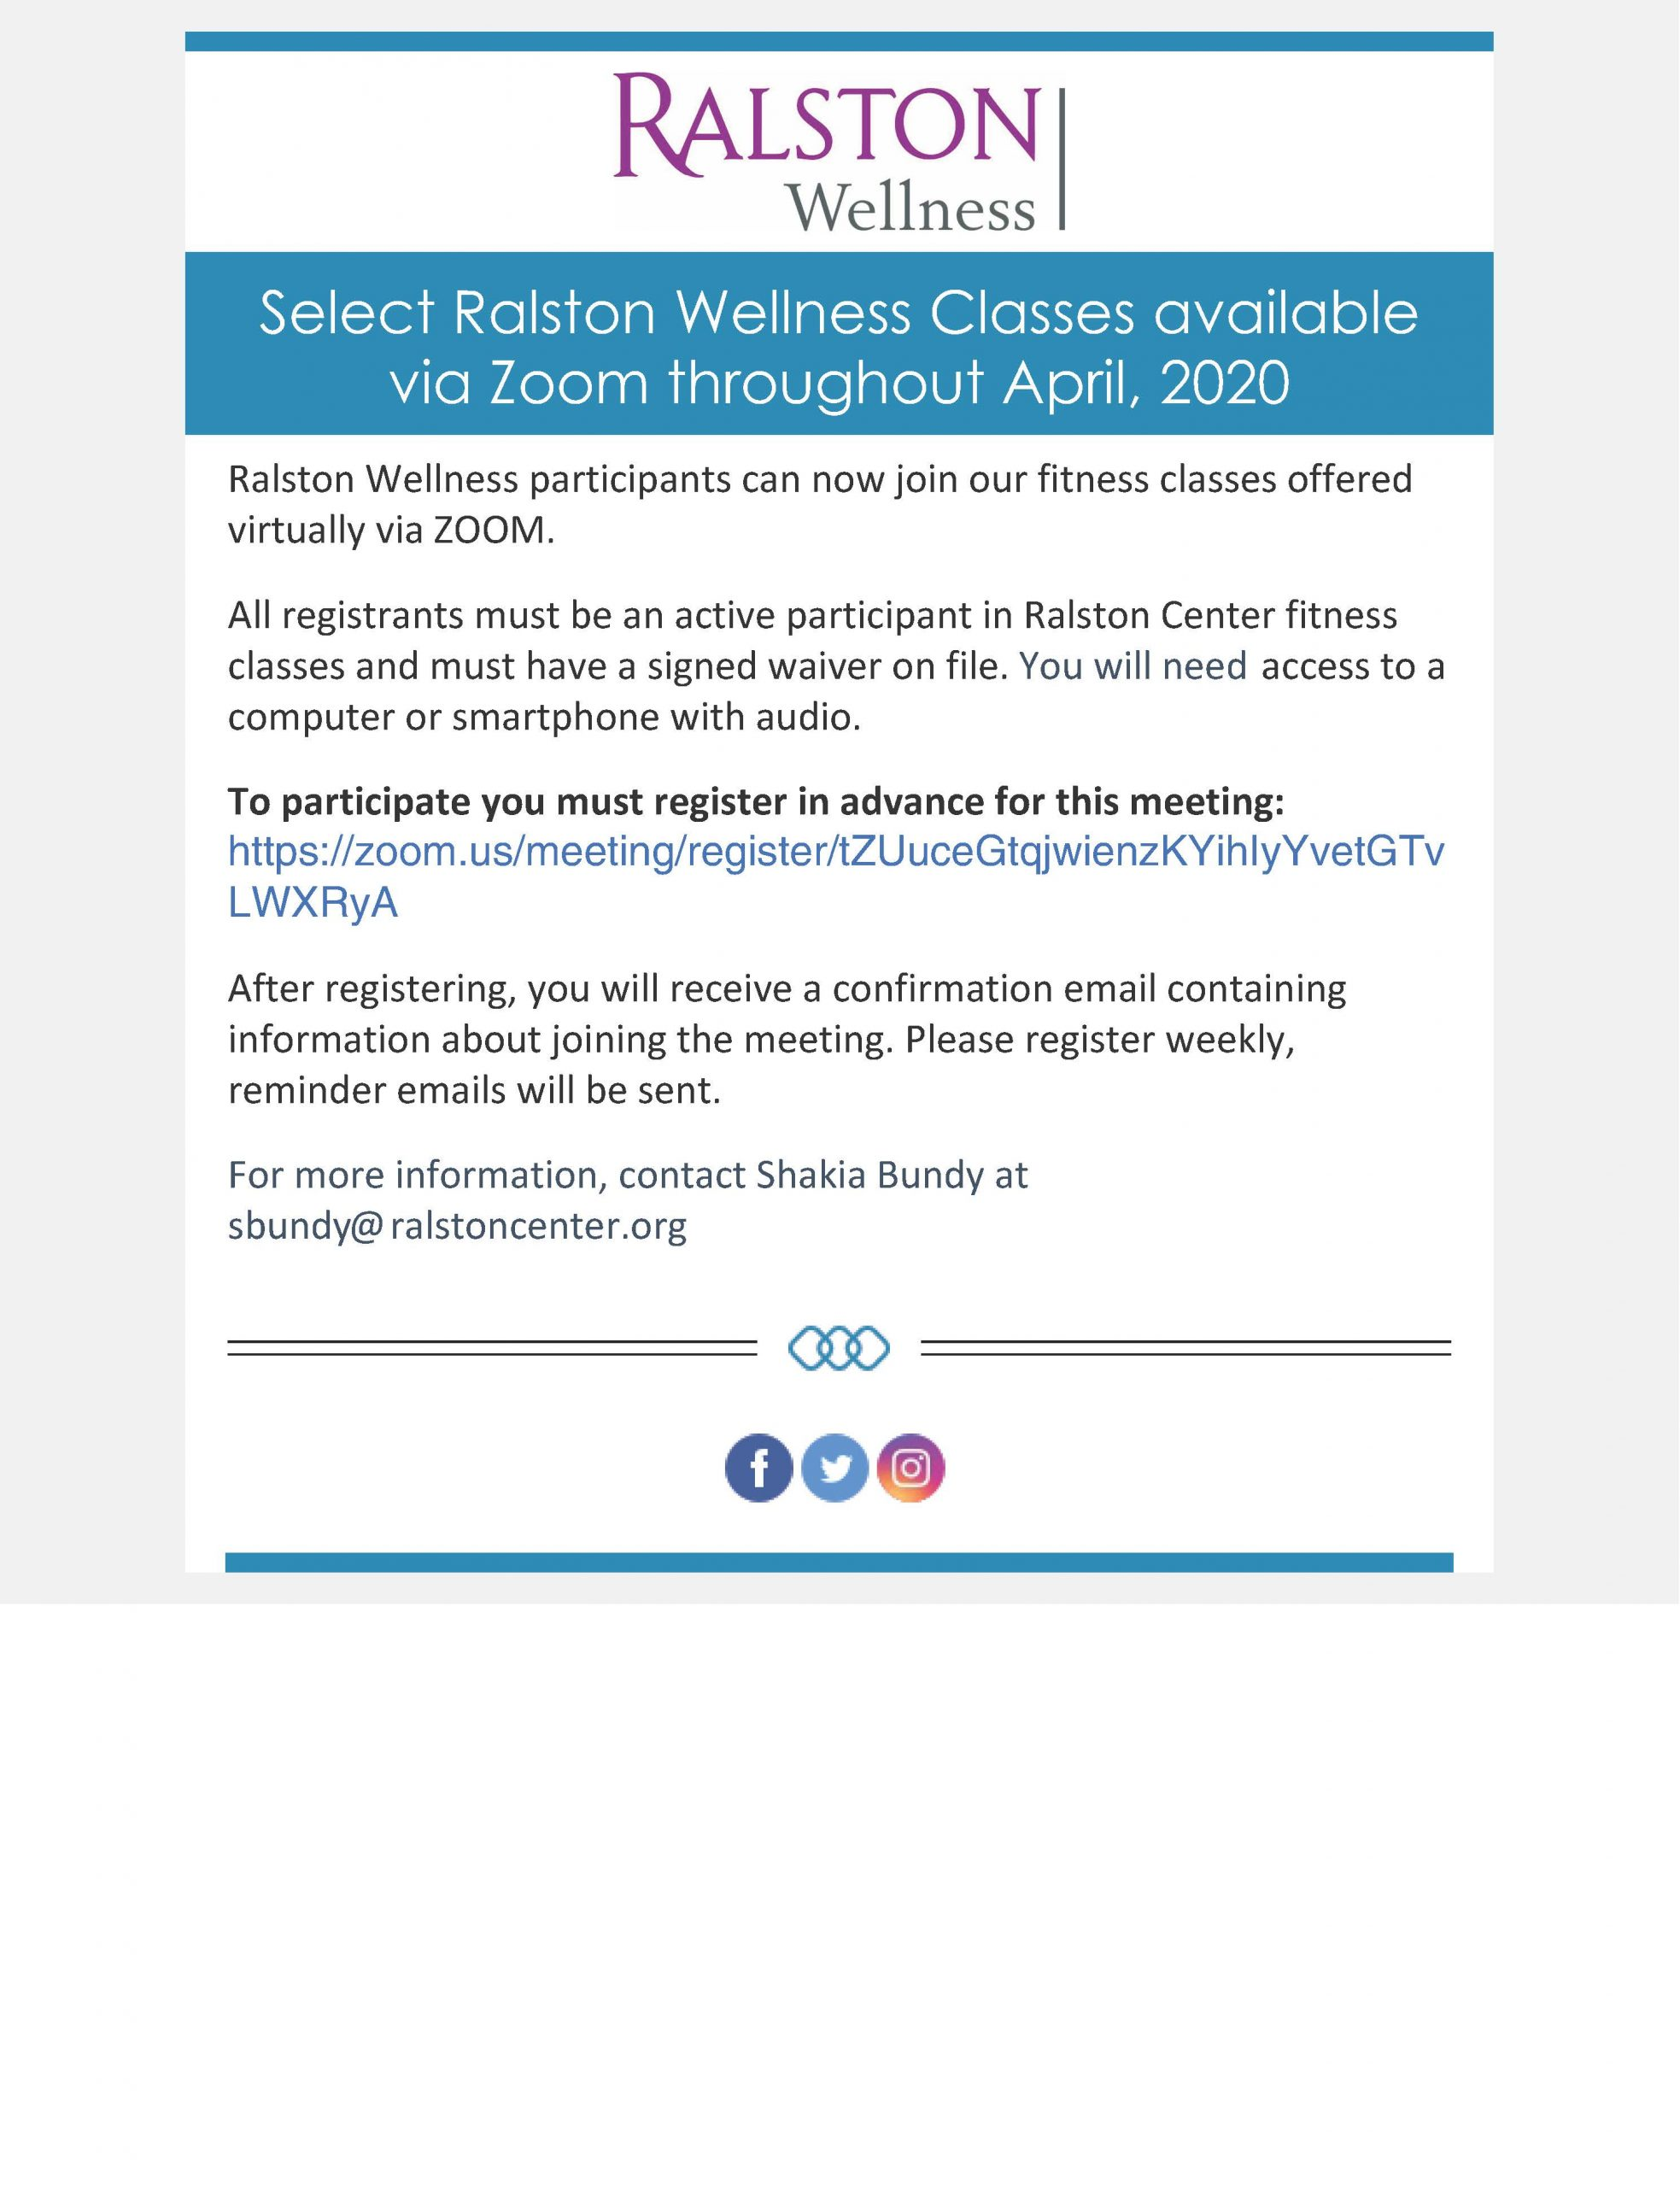 Ralston Wellness via Zoom